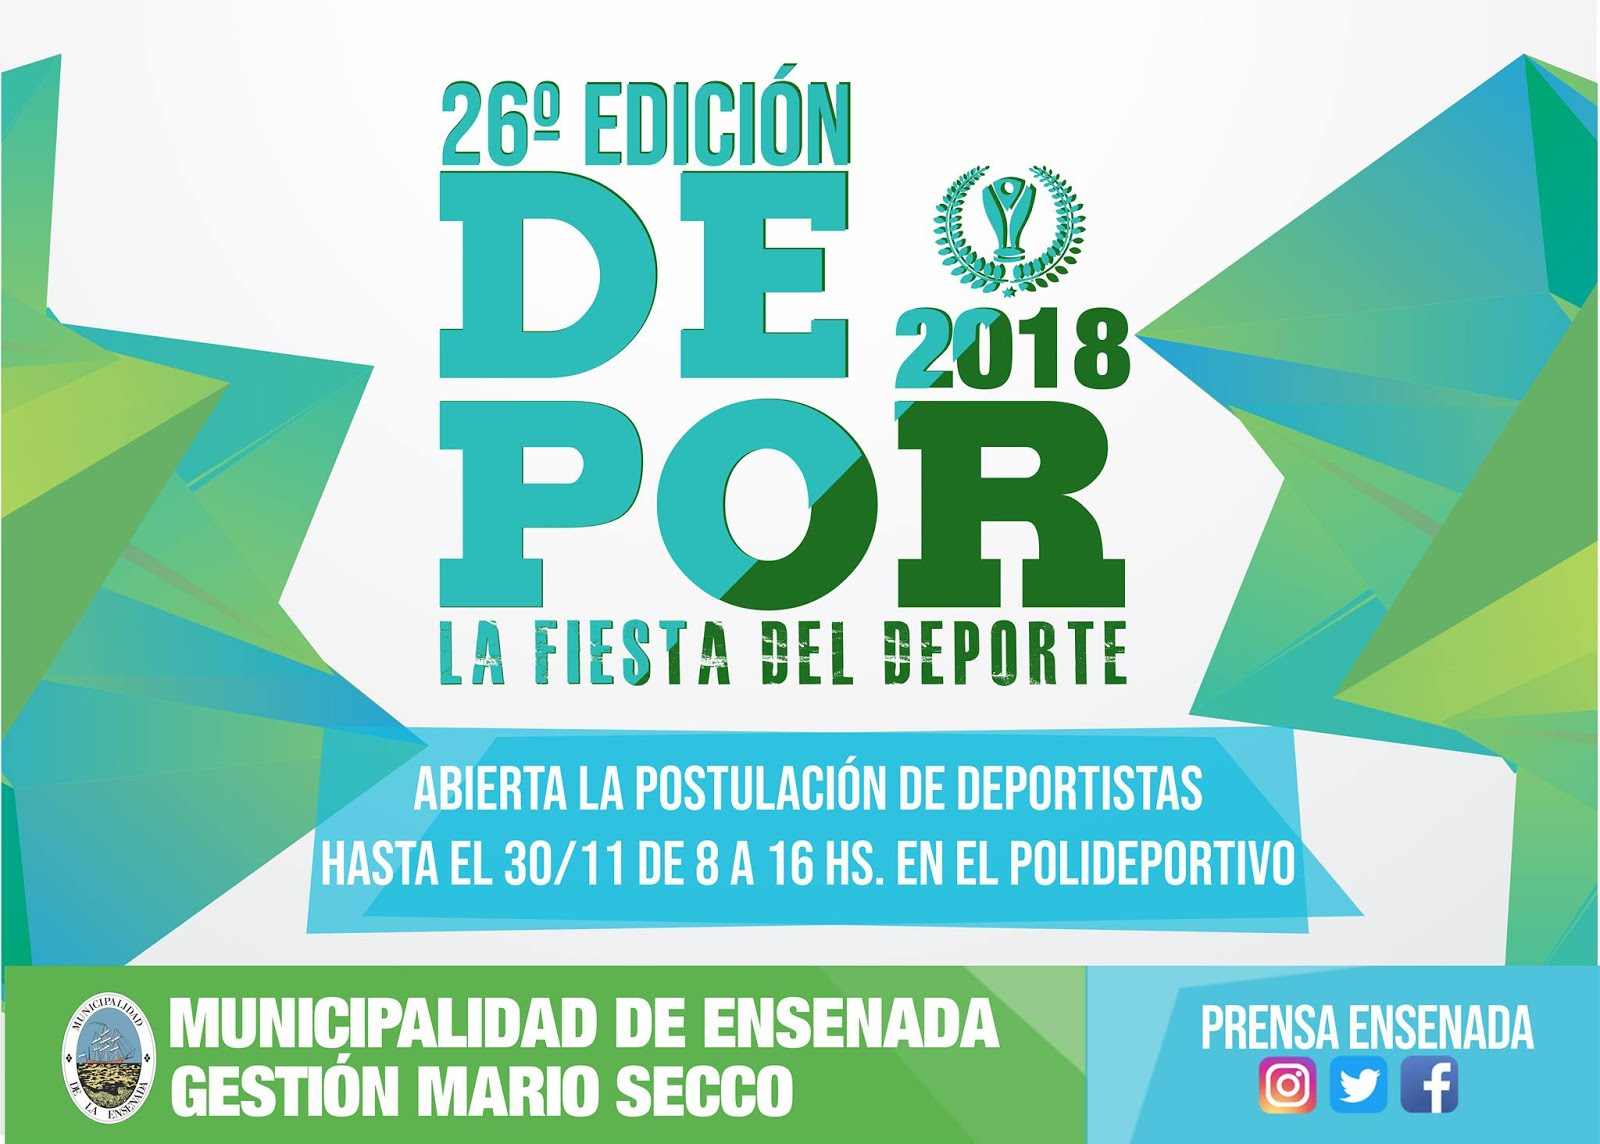 DEPOR 2018